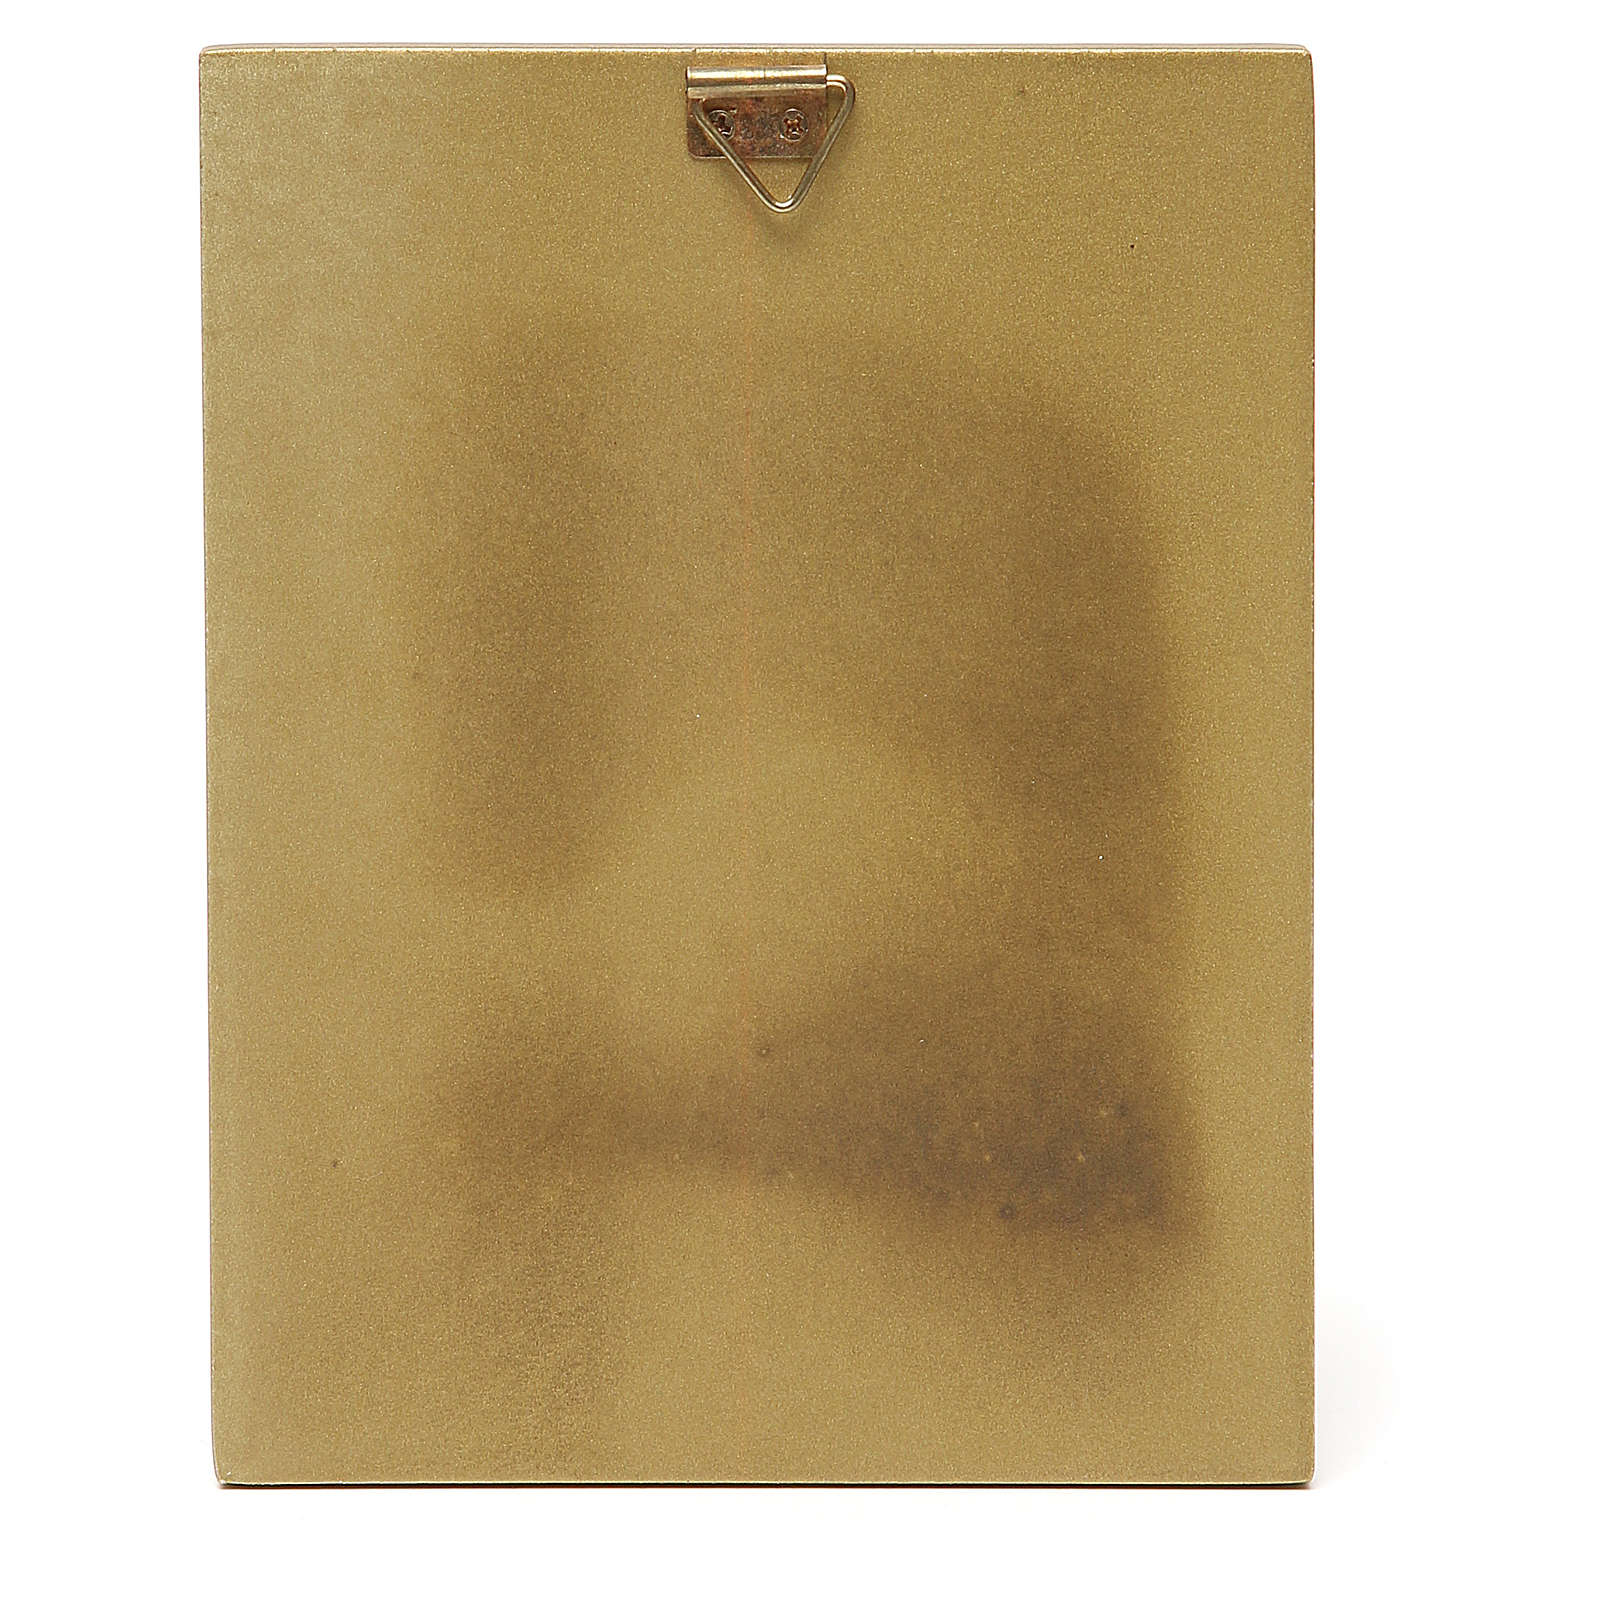 STOCK Small painting Angel golden border 14x11cm 3